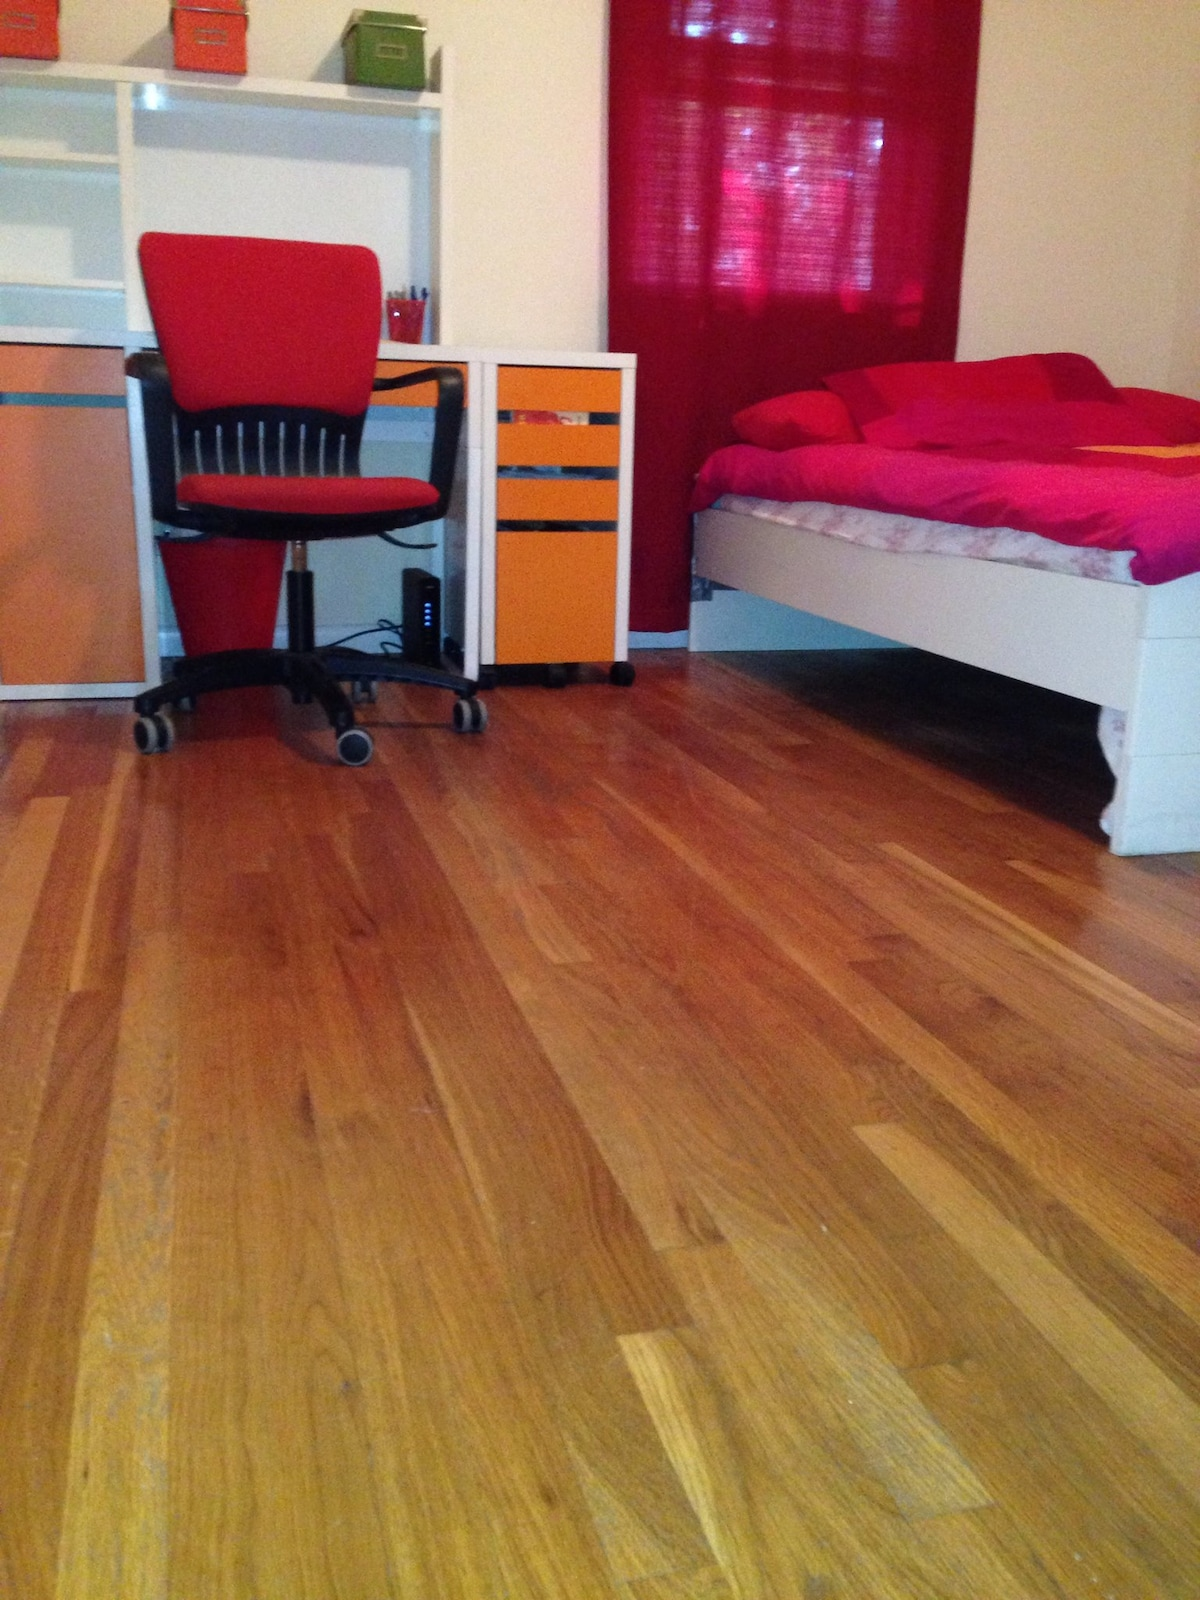 Shiny new hardwood floors